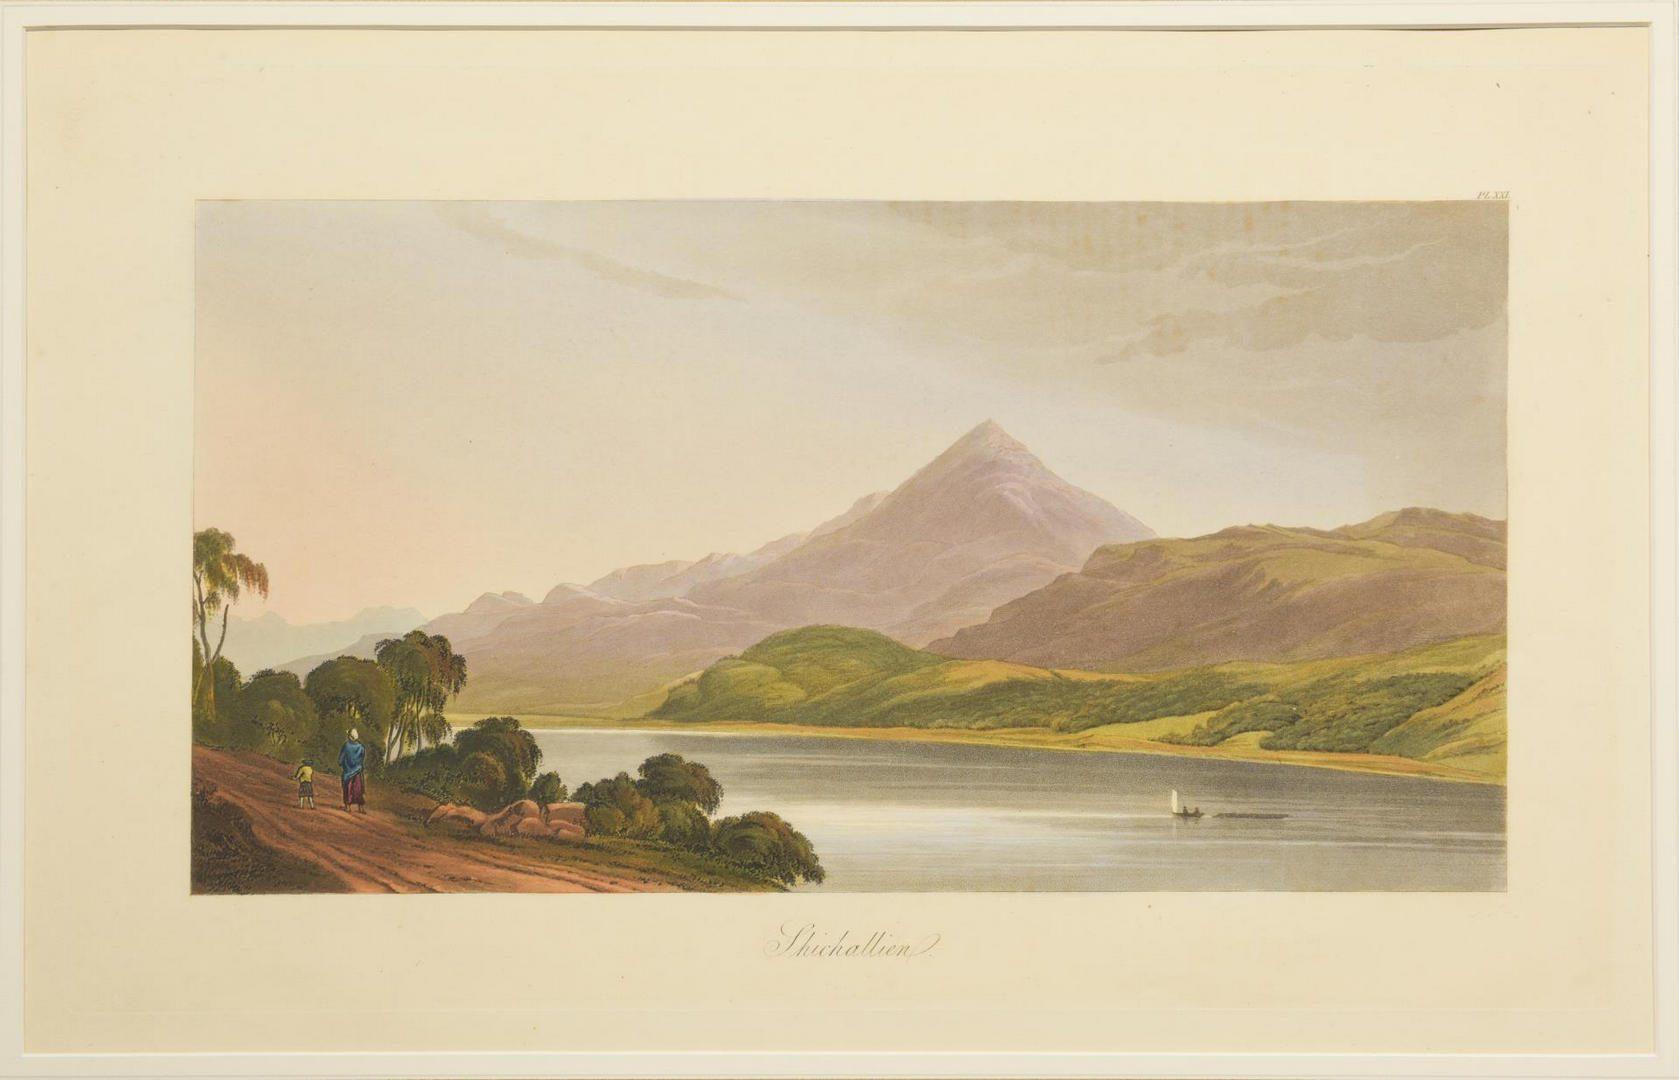 Lot 98: 4 George Fennel Robson Engravings, Henry Morton